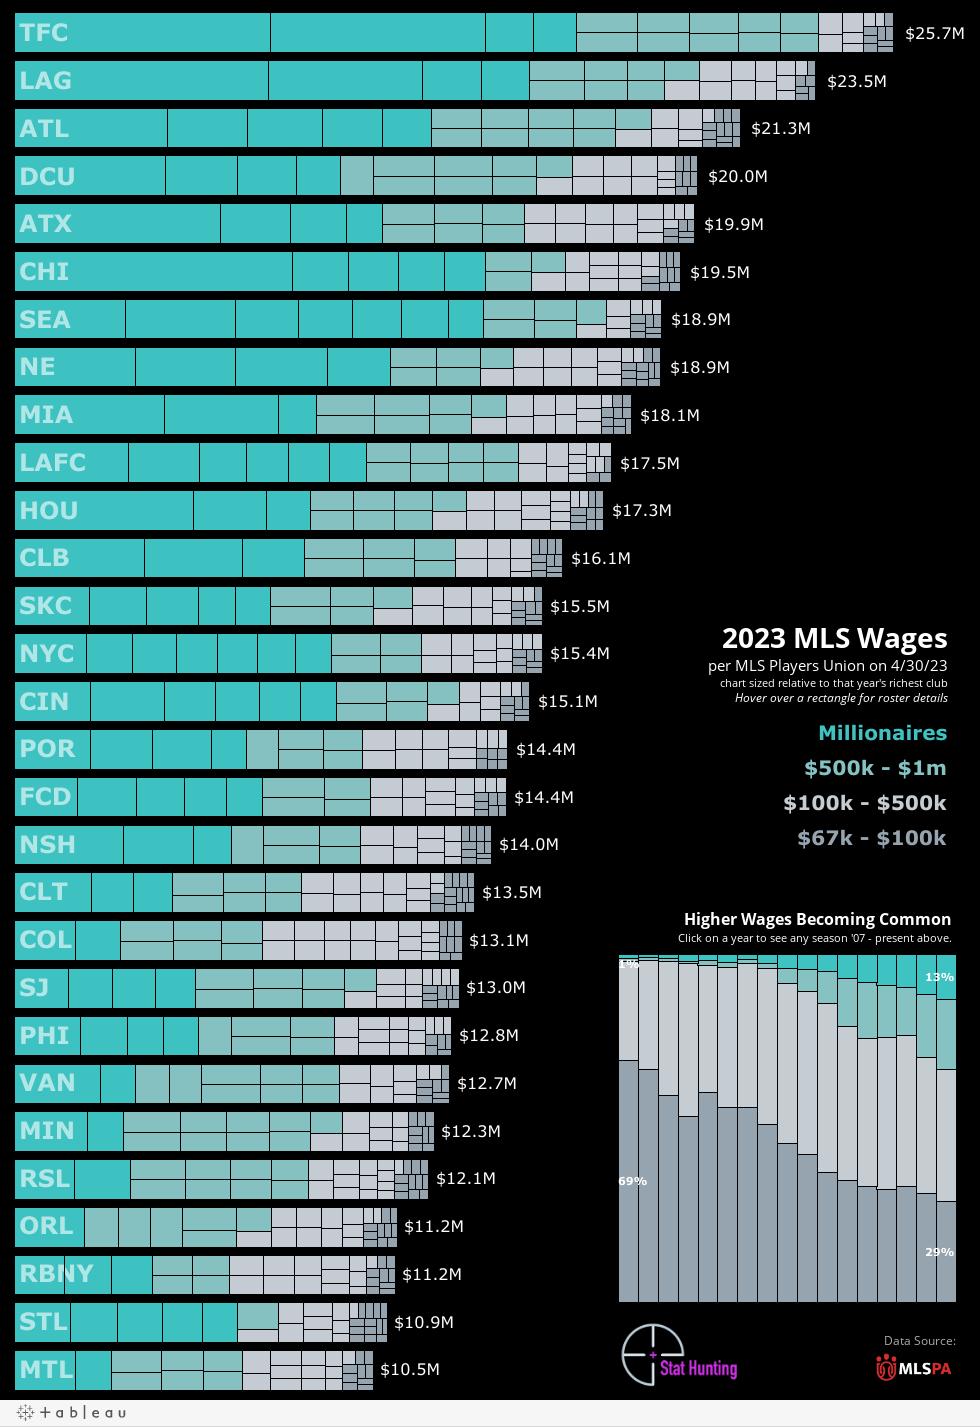 Wages in chosen year